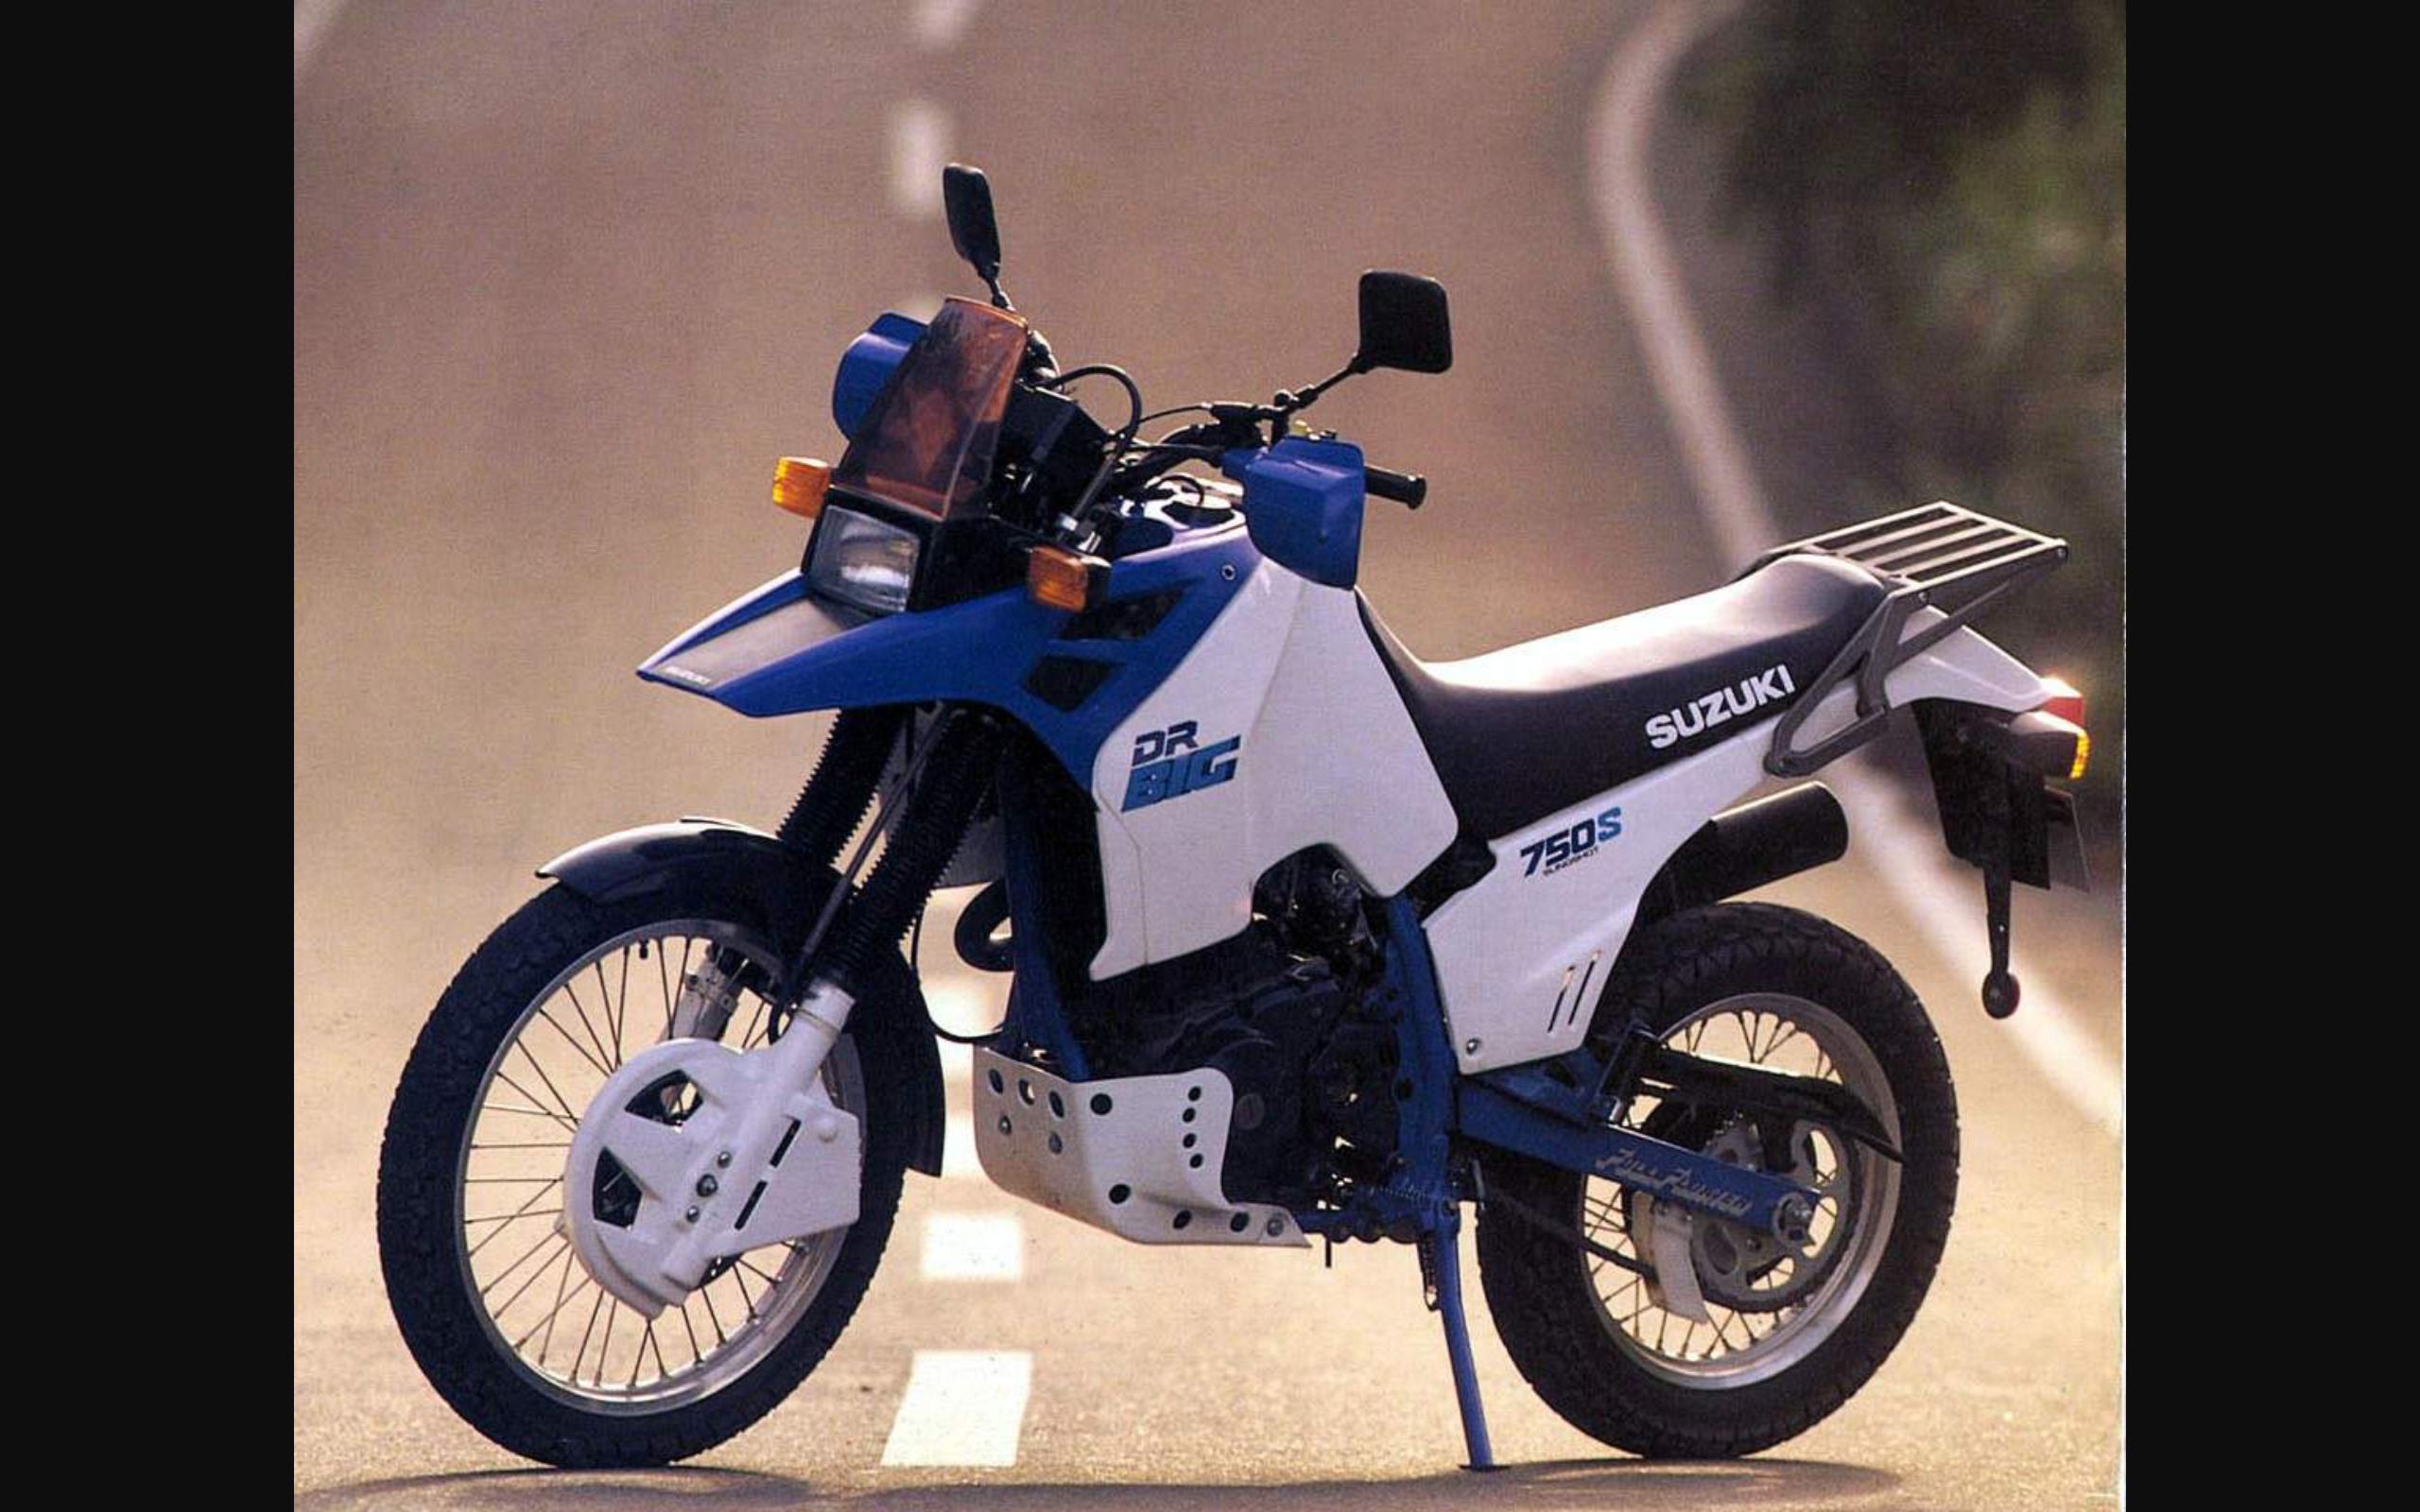 Kawasaki KLR 650 Cafe Racer? A good thing?